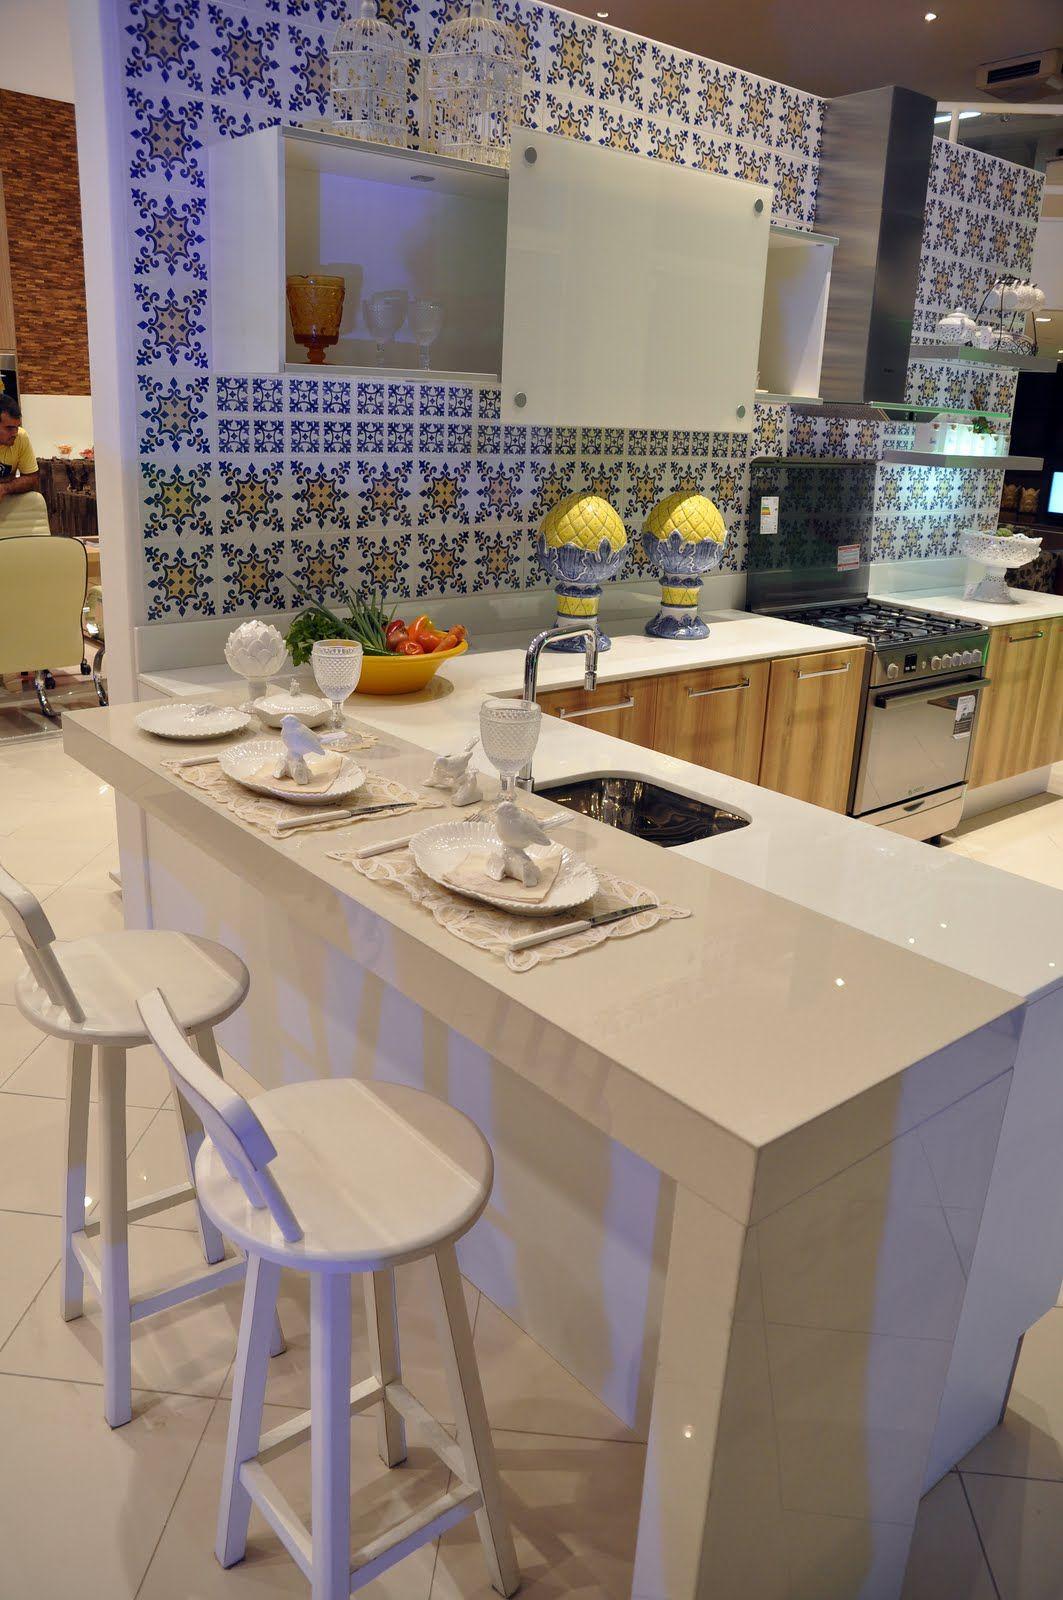 Bancadas para cozinha 1063 1600 cocinas modernas pinterest cocina moderna - Banquetas para cocina ...